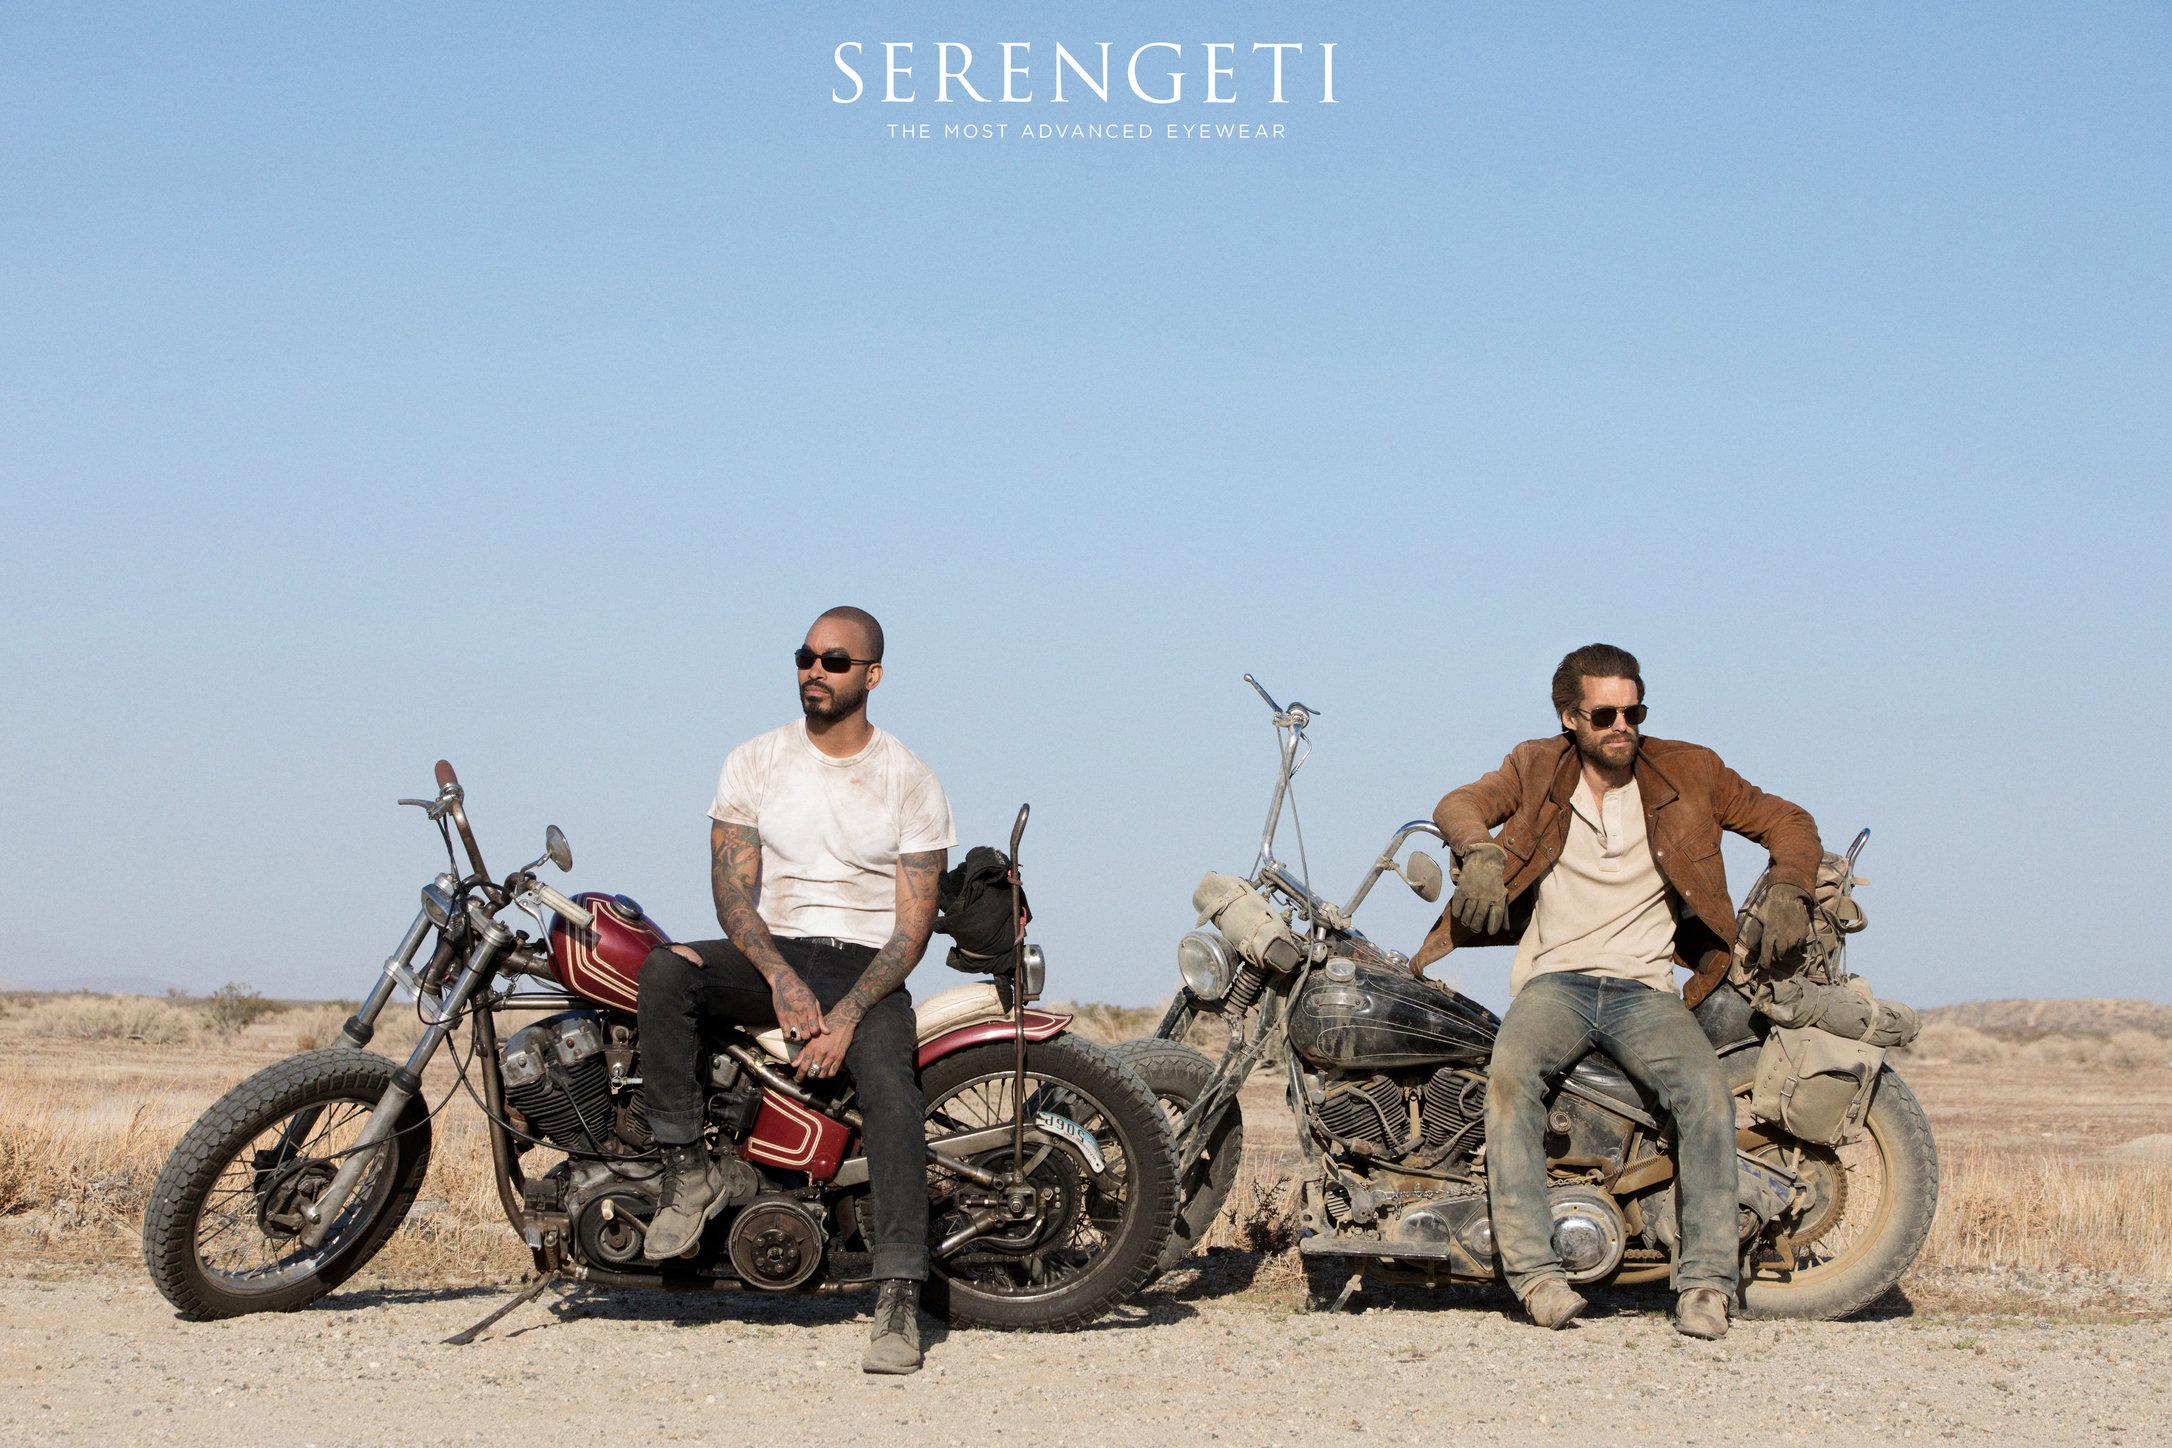 Serengeti_Stills_Card14_4264_log0.jpg